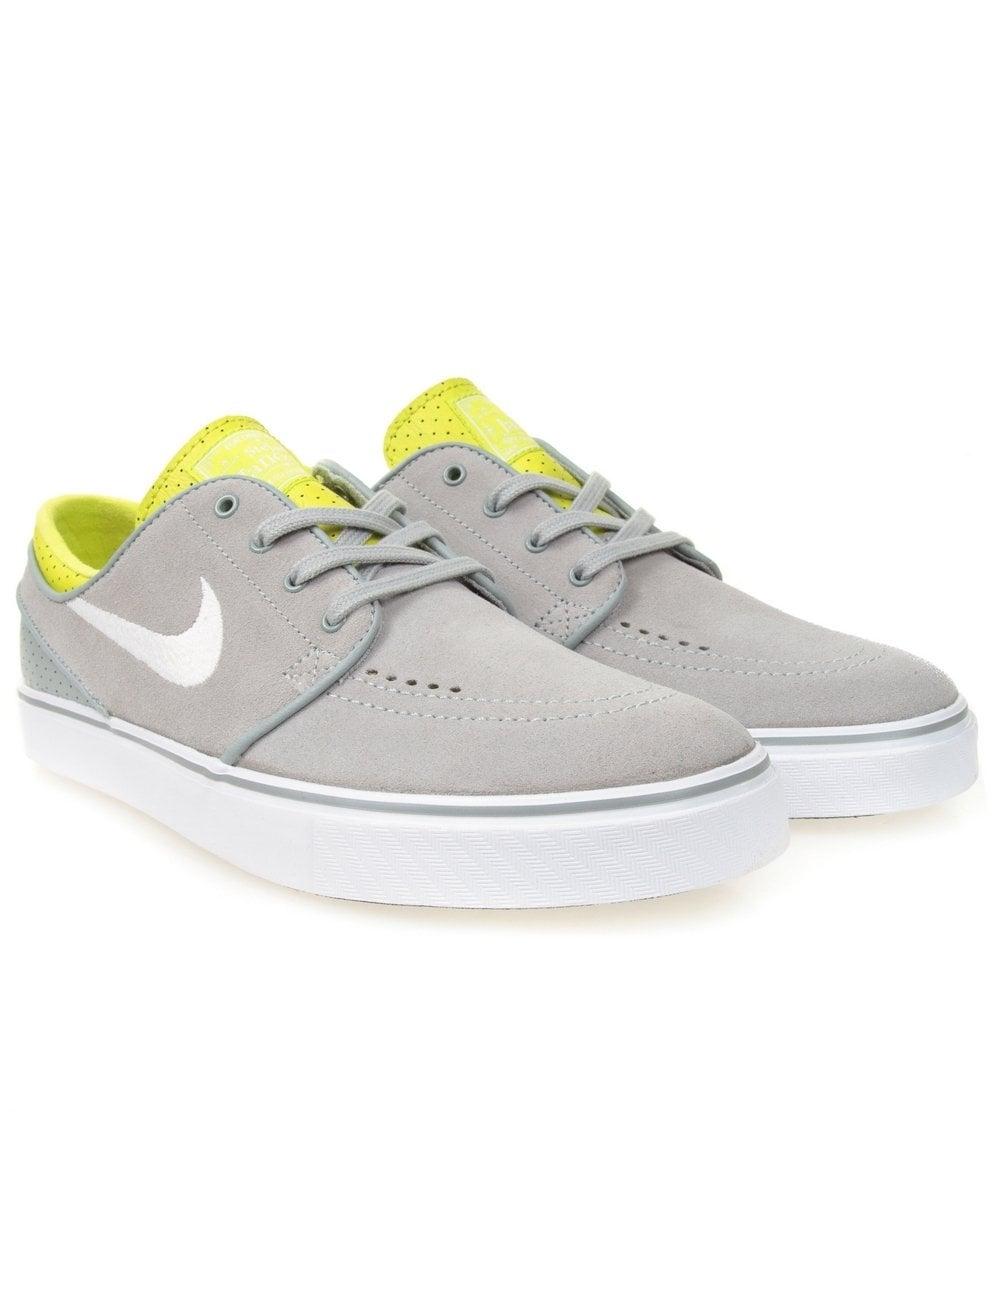 100% authentic 90024 e0b62 Nike SB Zoom Stefan Janoski - Base Grey